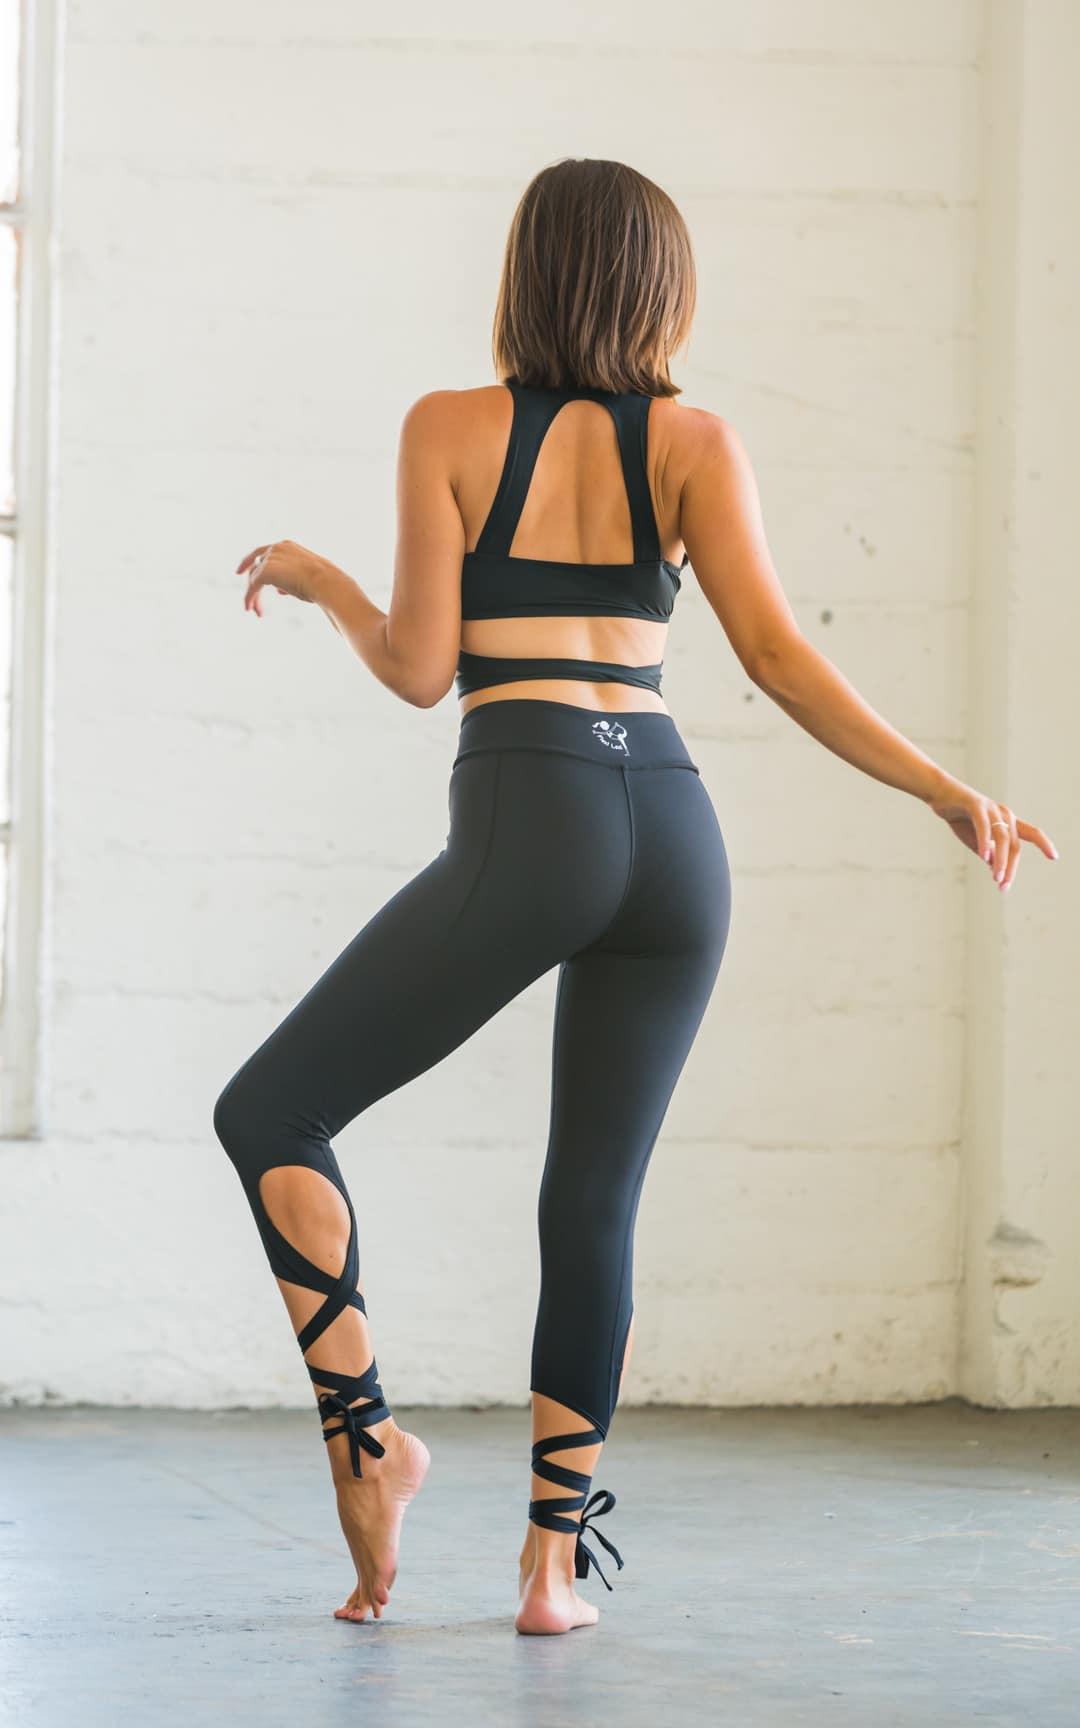 Sexy leggings galleries